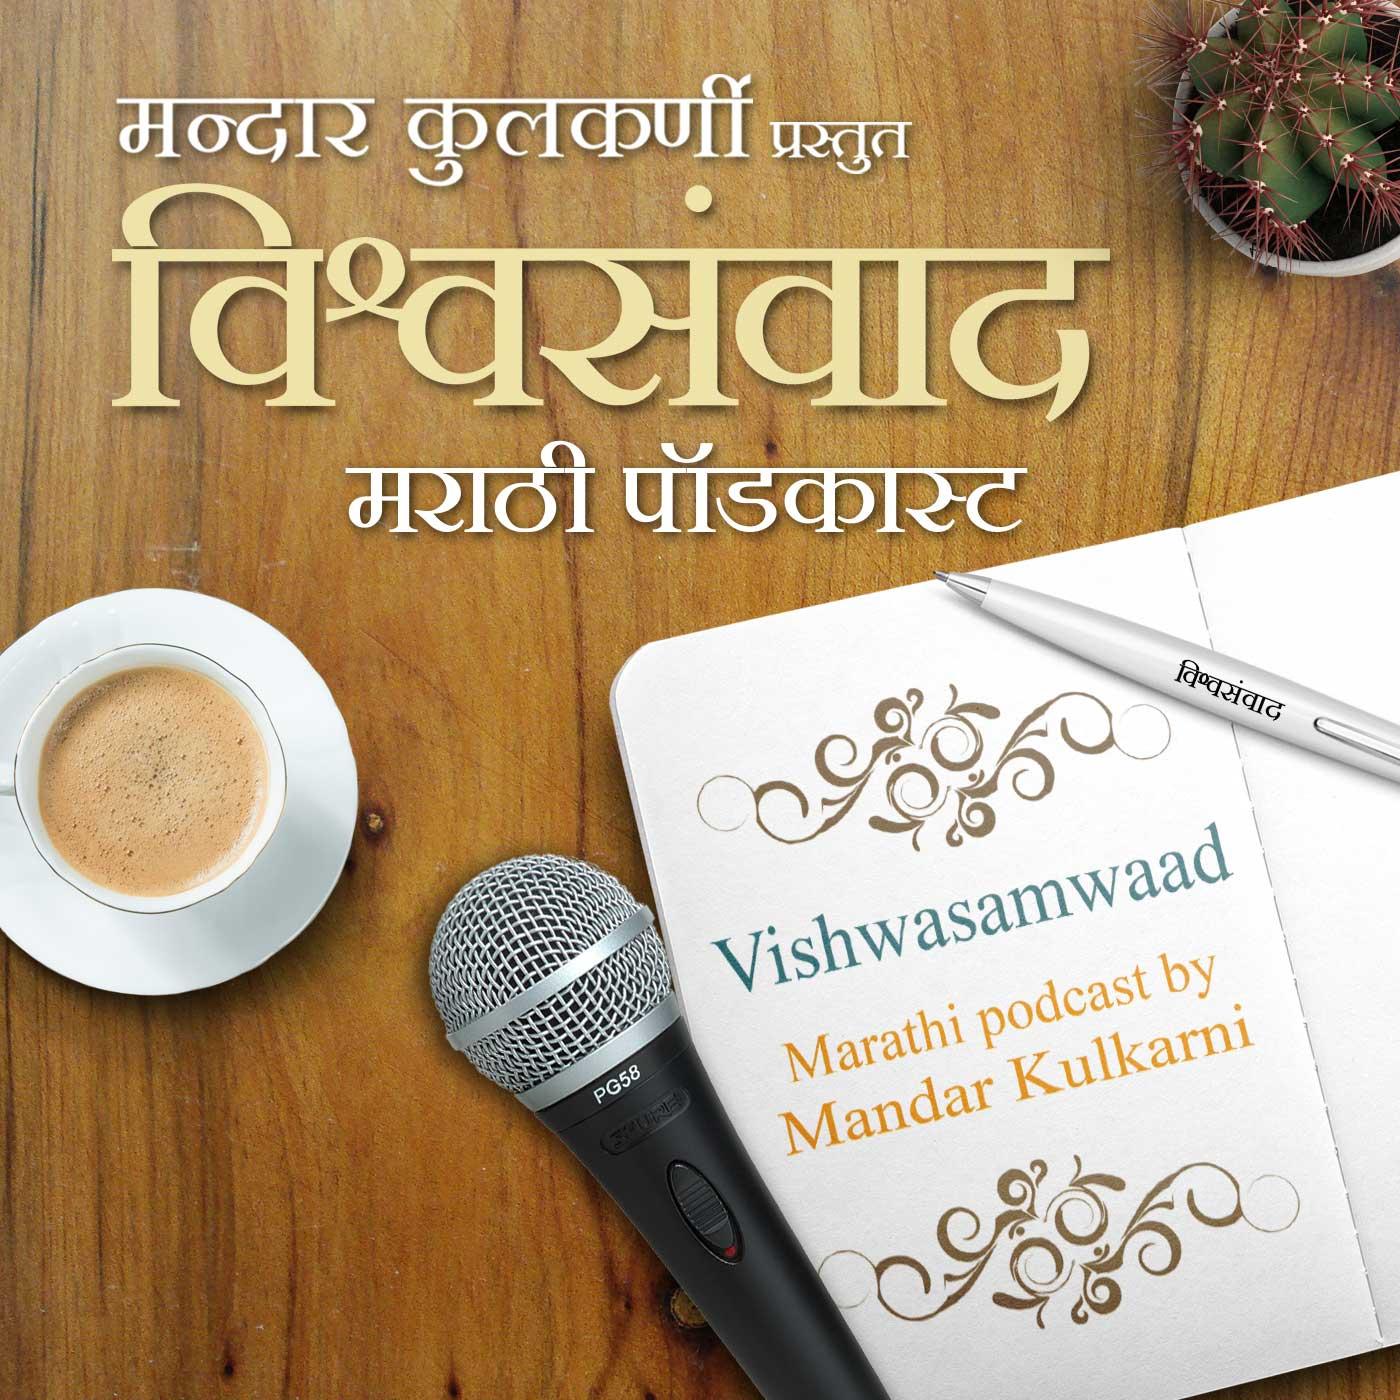 विश्वसंवाद | Vishwasamwaad